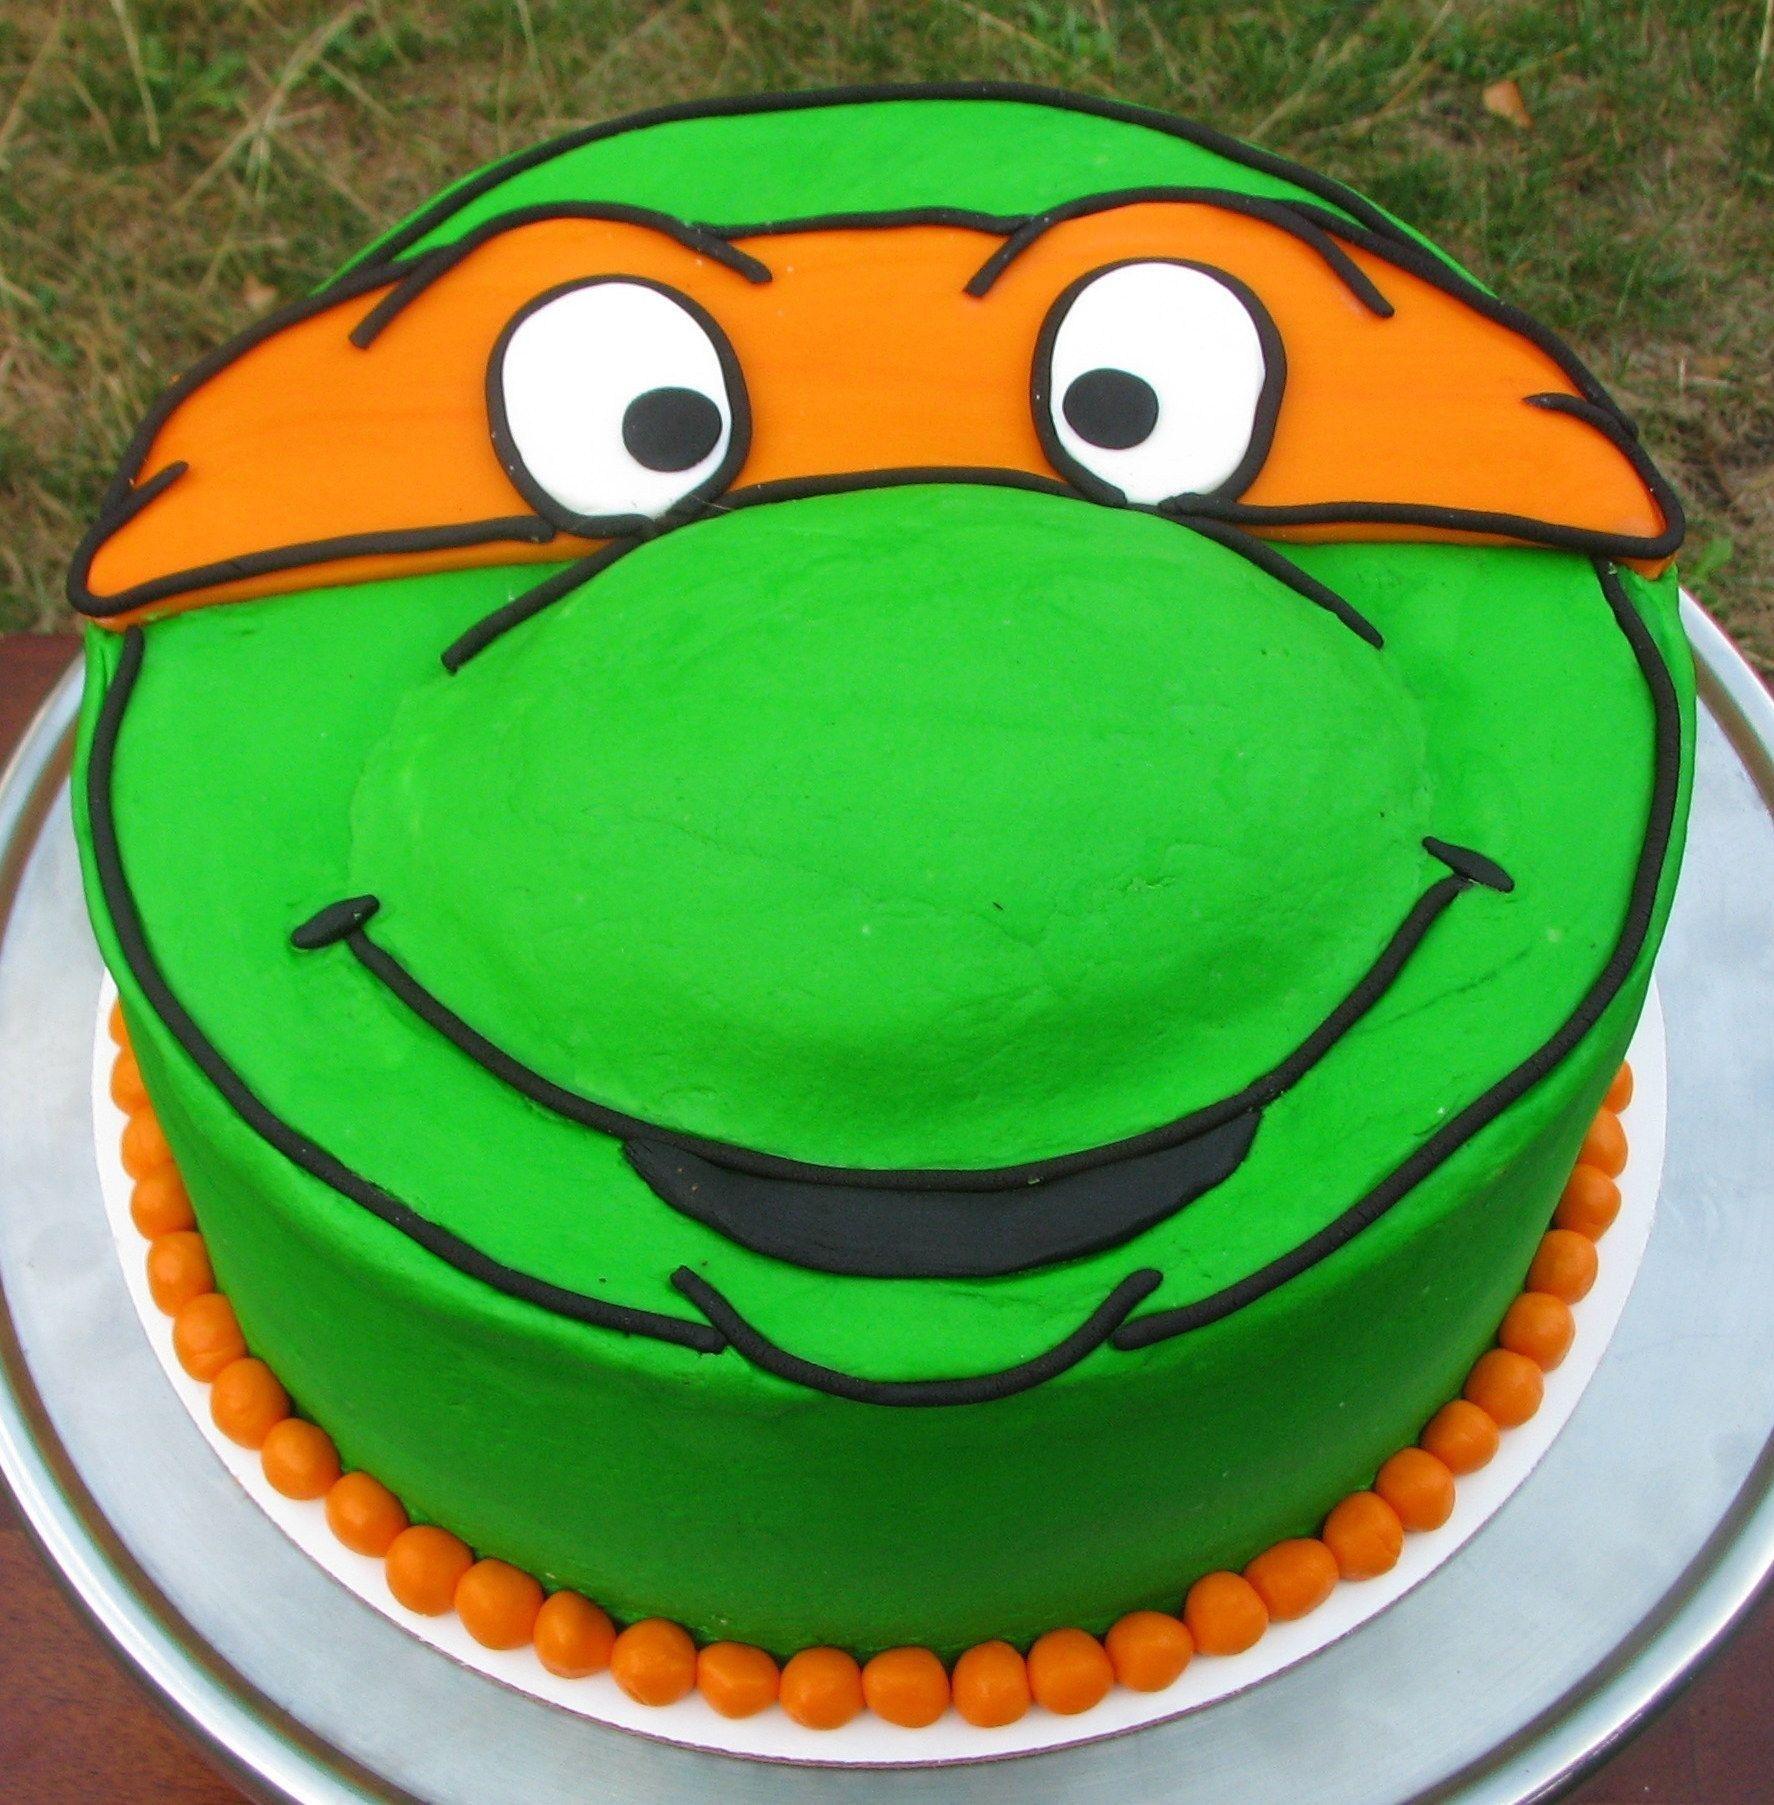 Tremendous Teenage Mutant Ninja Turtle Birthday Cake Teenage Mutant Ninja Funny Birthday Cards Online Inifofree Goldxyz